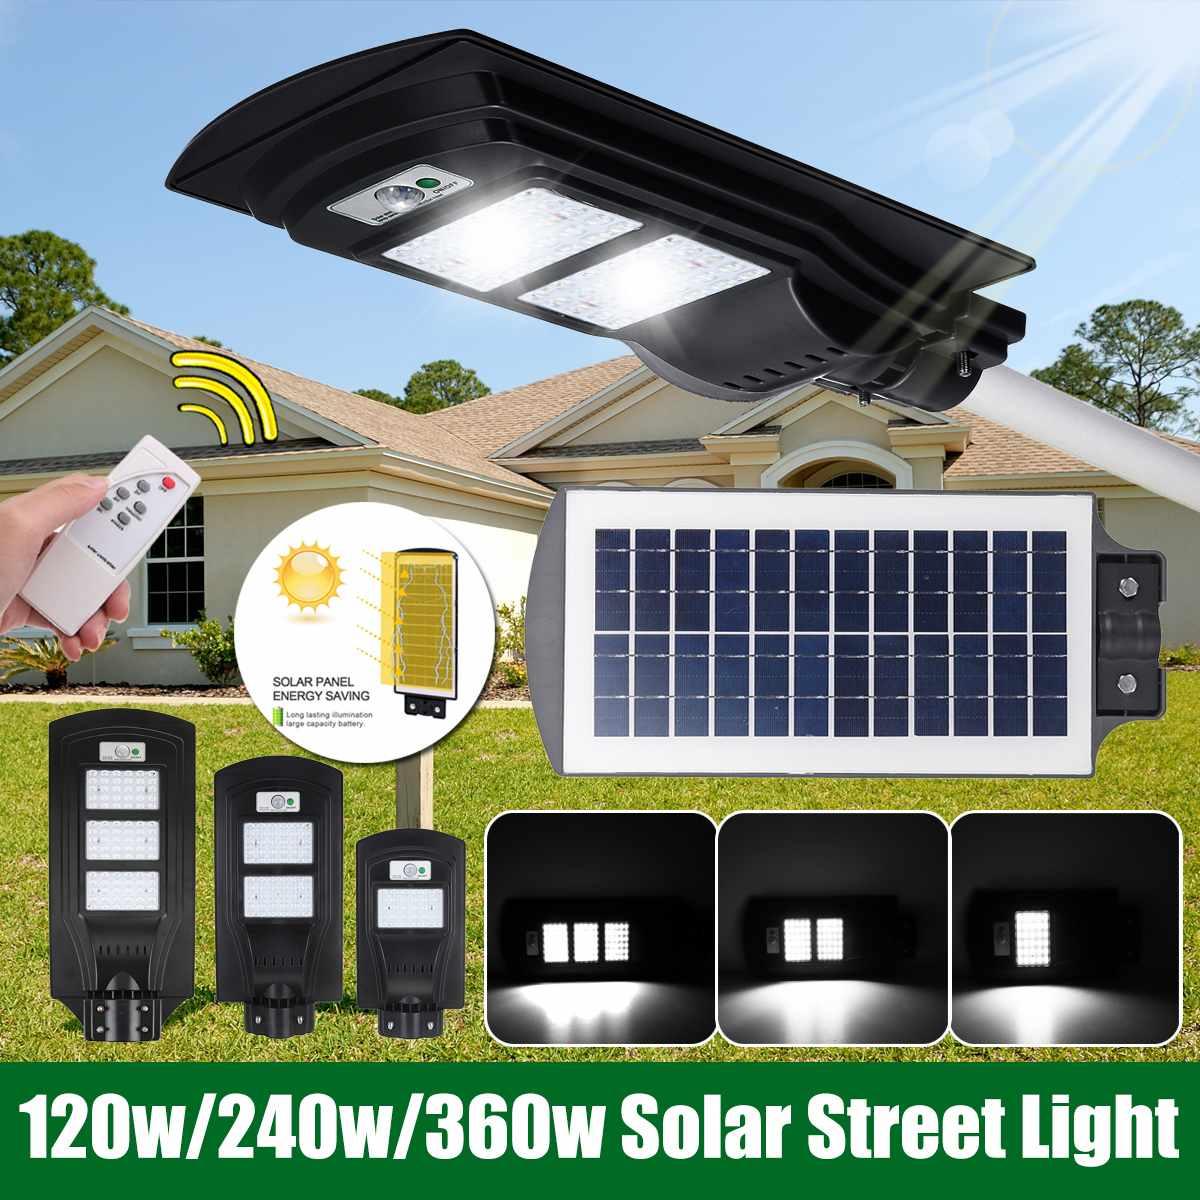 120W 240W 360W Remote Control LED Solar Street Light Radar PIR Motion Sensor Wall Timing Lamp Waterproof for Plaza Garden Yard